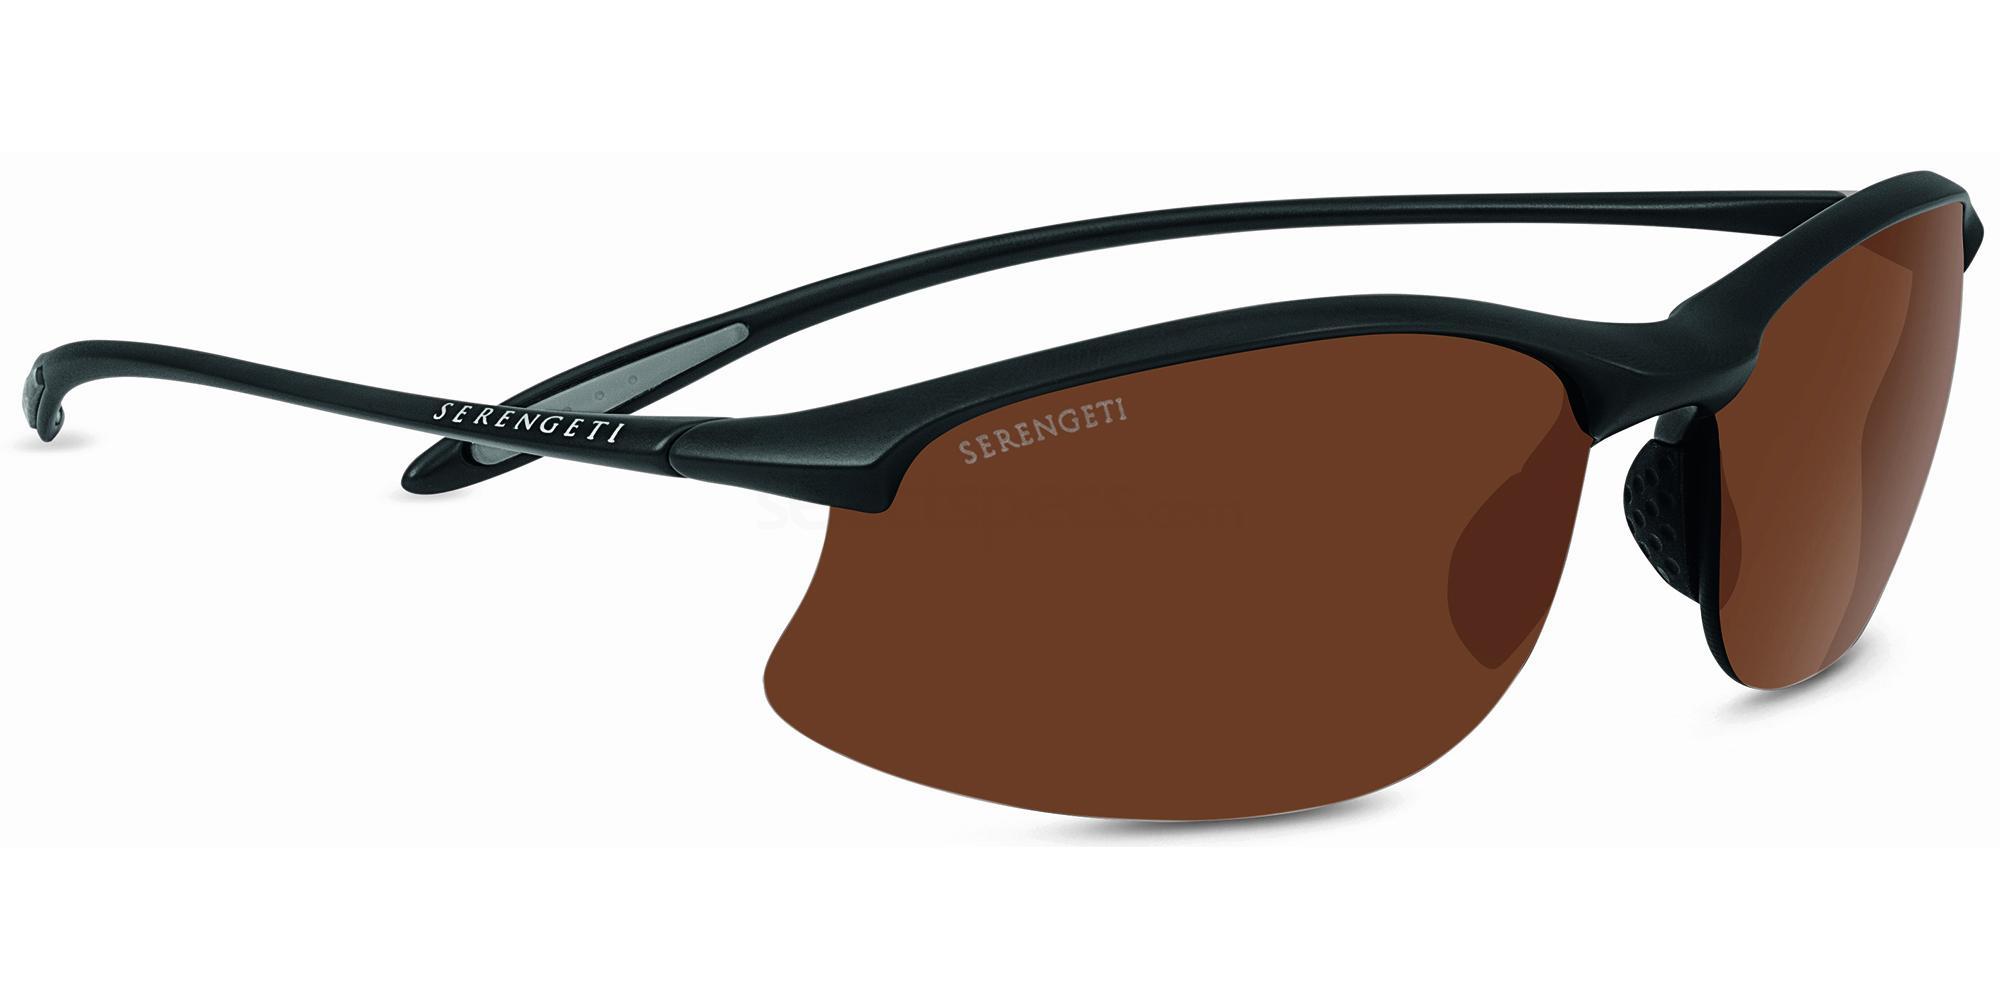 7356 Polarmax MAESTRALE Sunglasses, Serengeti